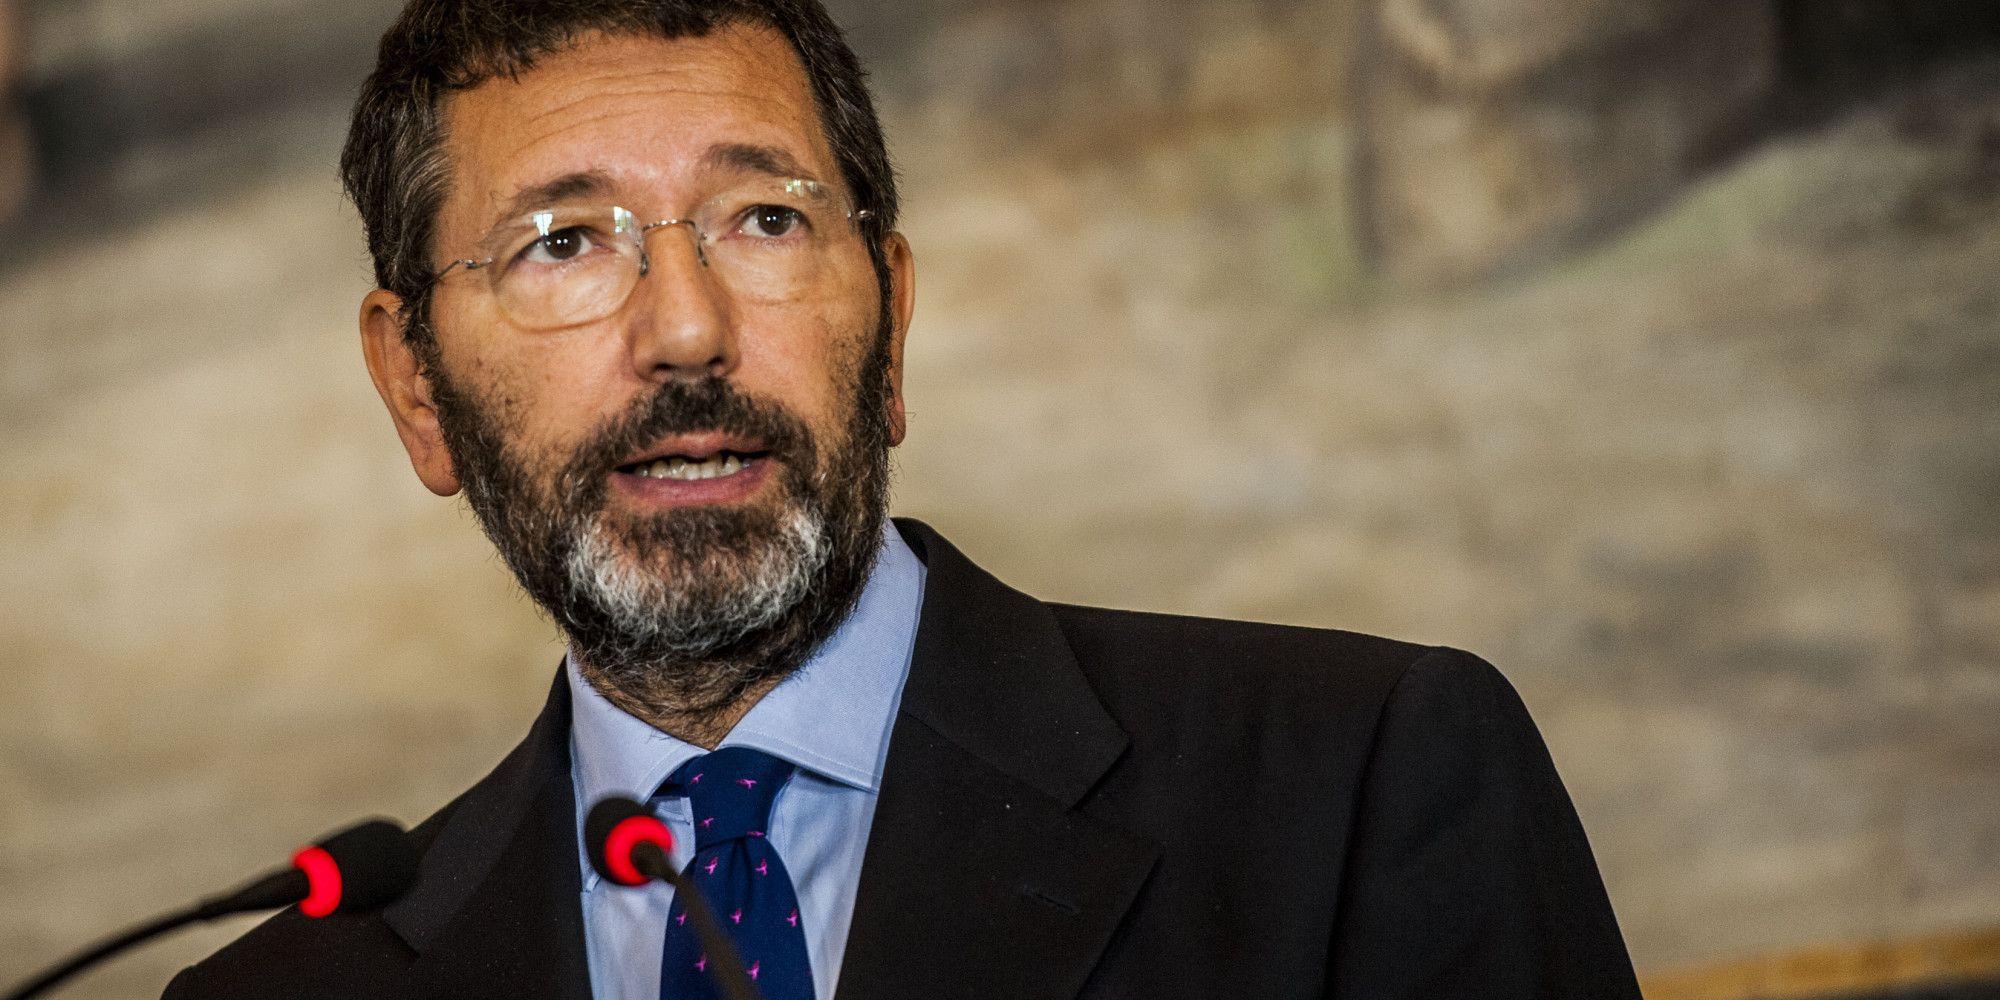 Roma, Marino biasima Renzi e Governo